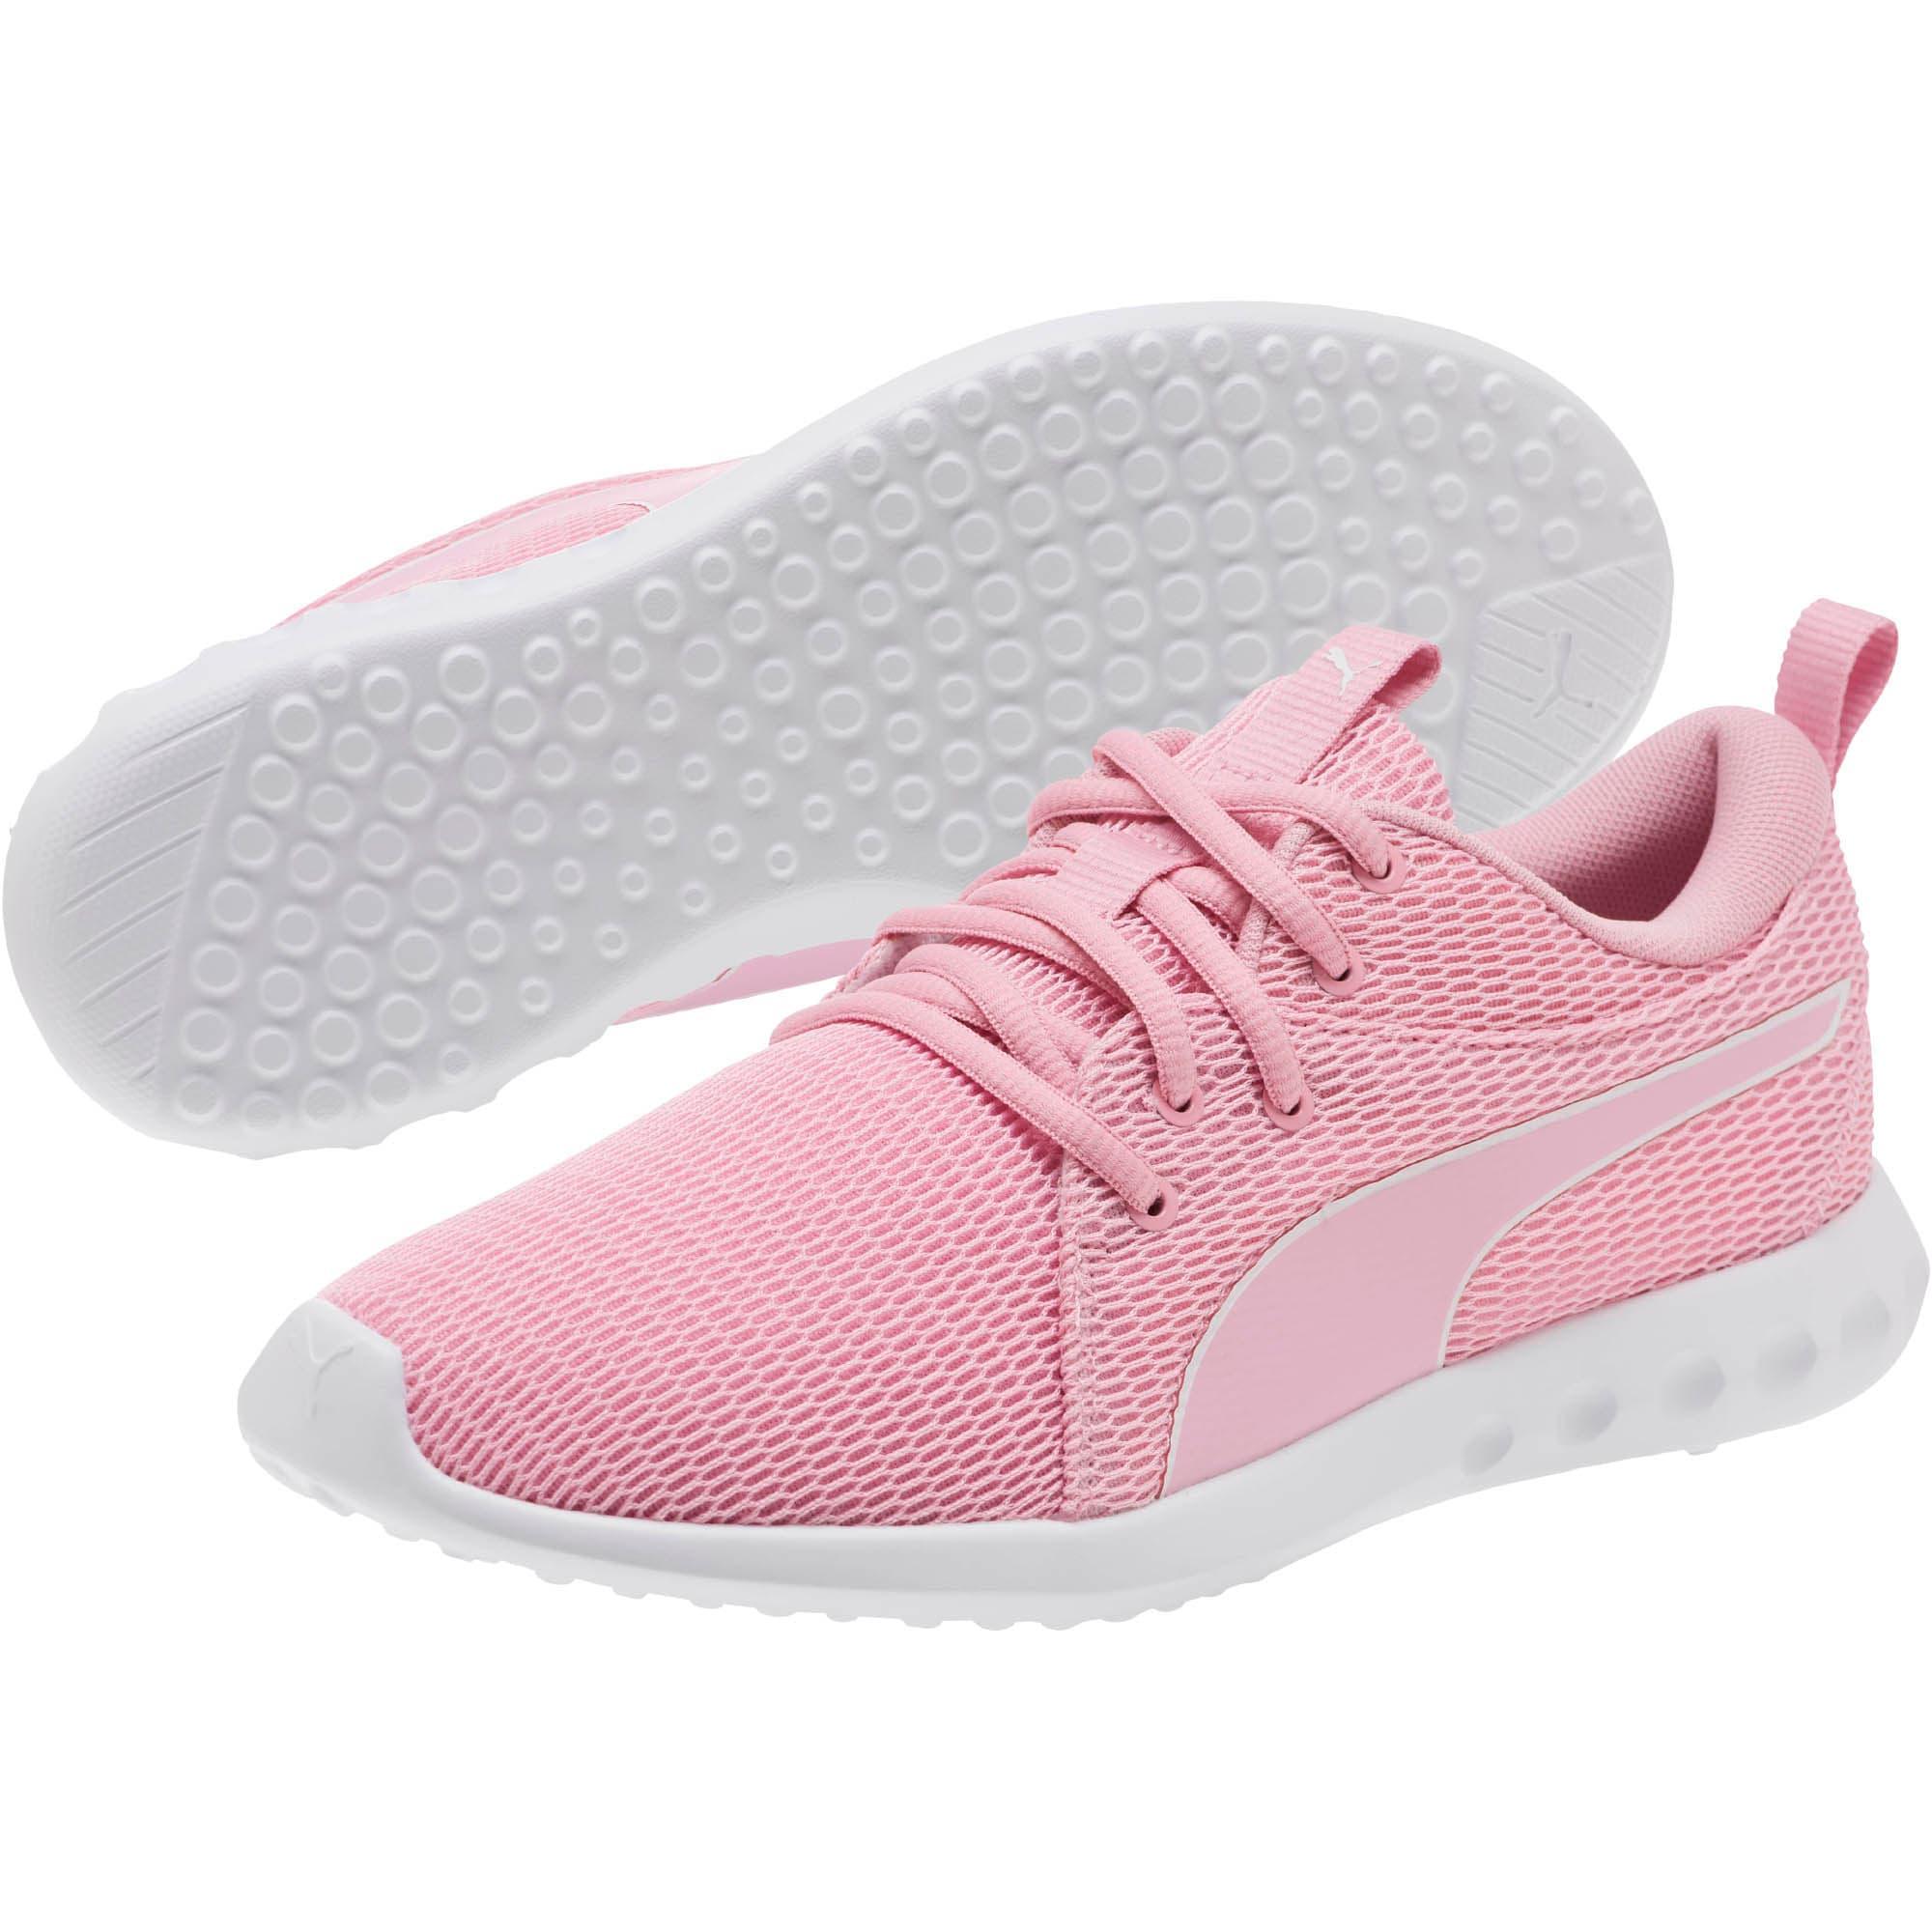 Thumbnail 2 of Carson 2 New Core Women's Training Shoes, Pale Pink-Puma White, medium